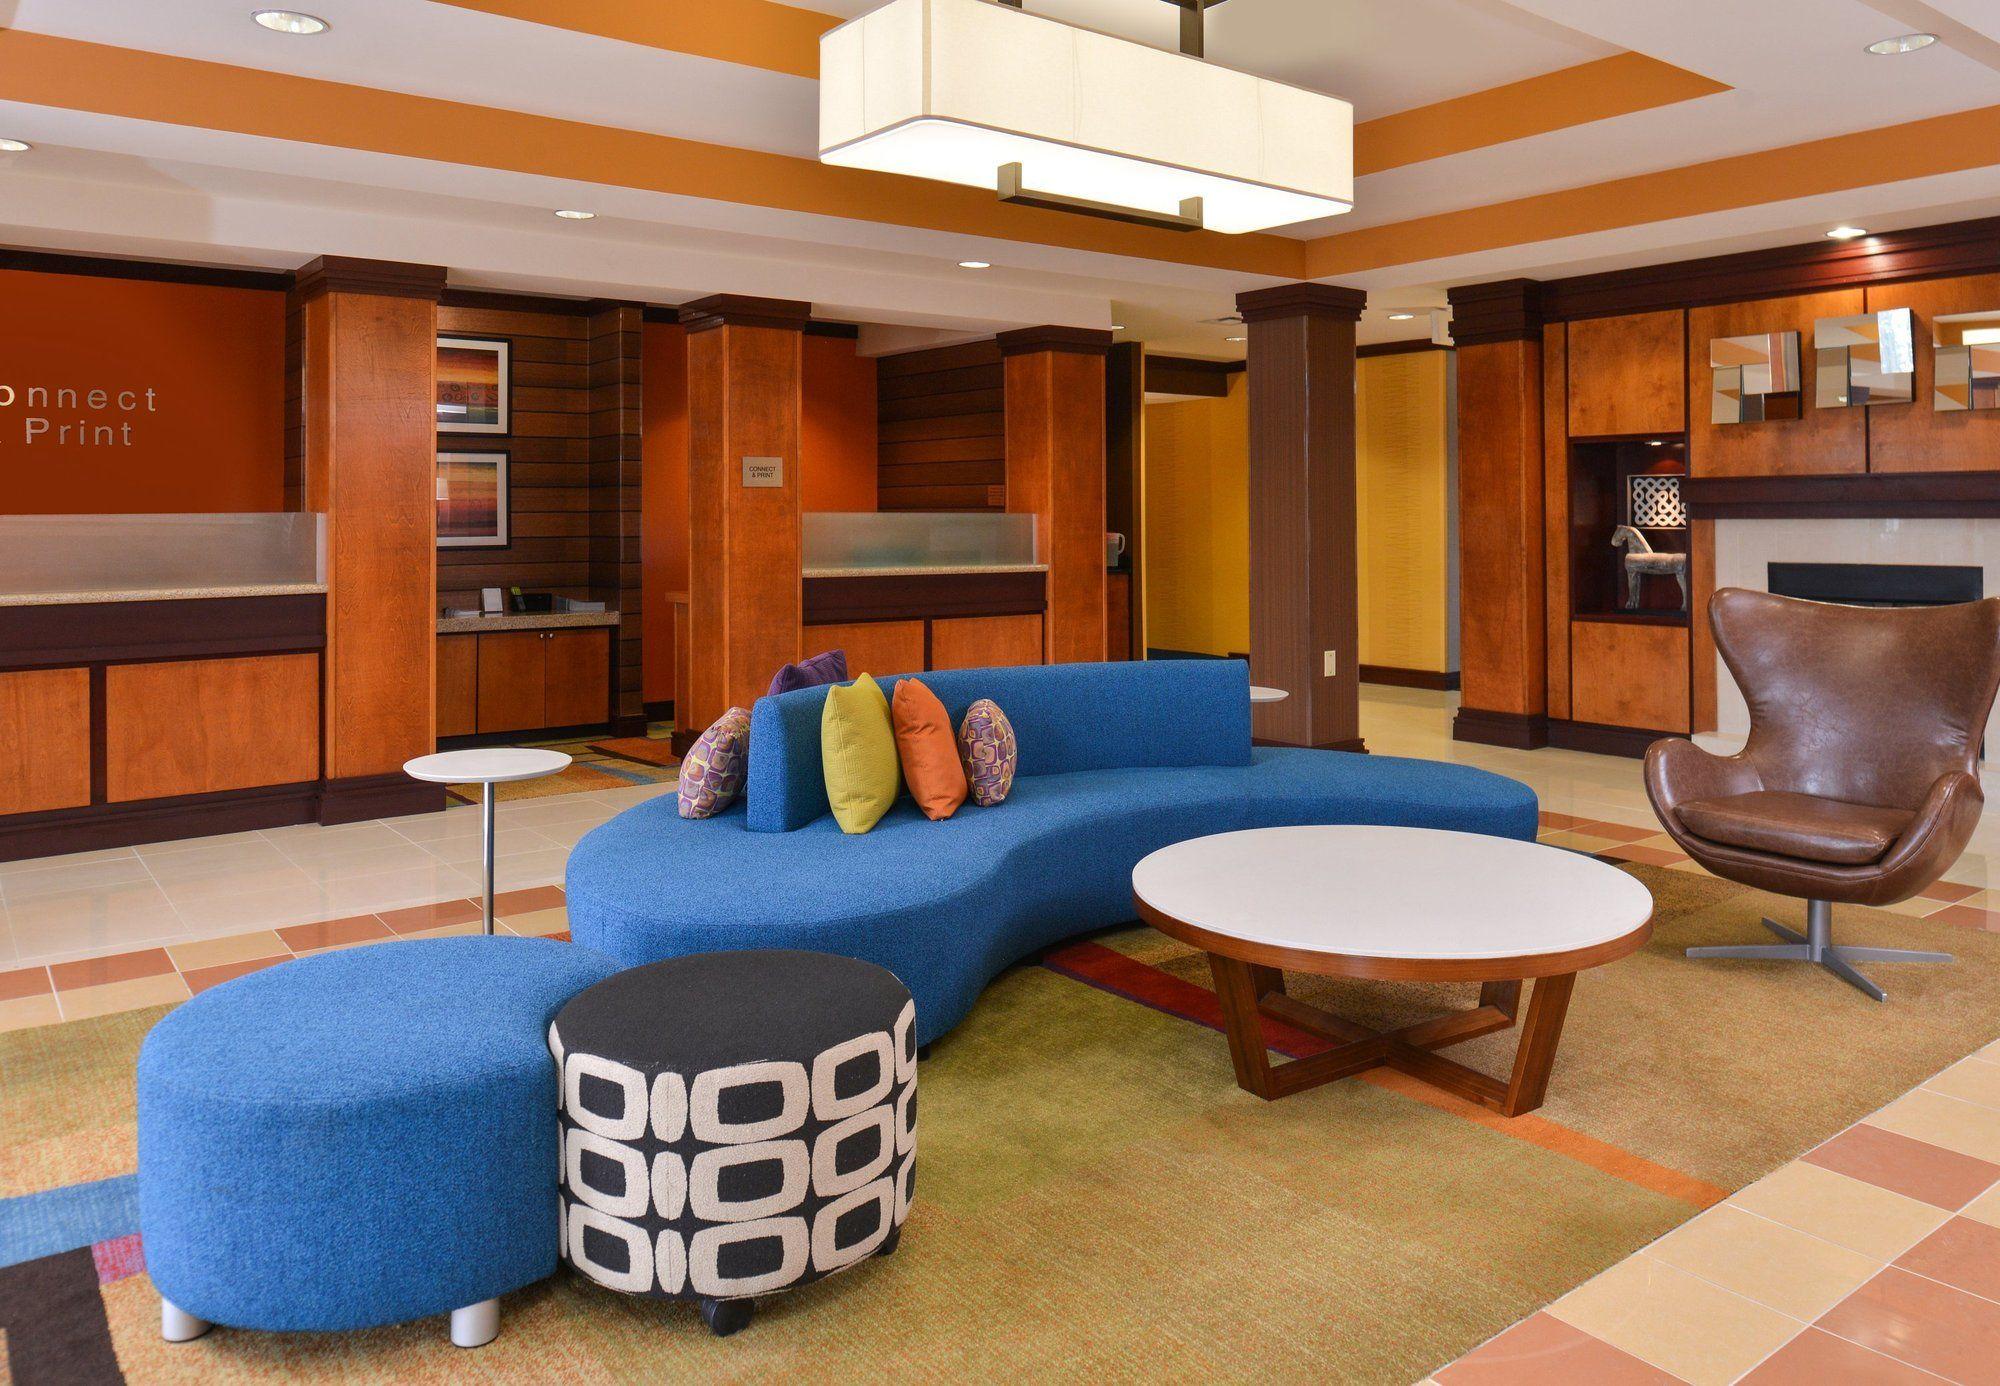 Fairfield Inn & Suites by Marriott Bessemer in Bessemer, AL